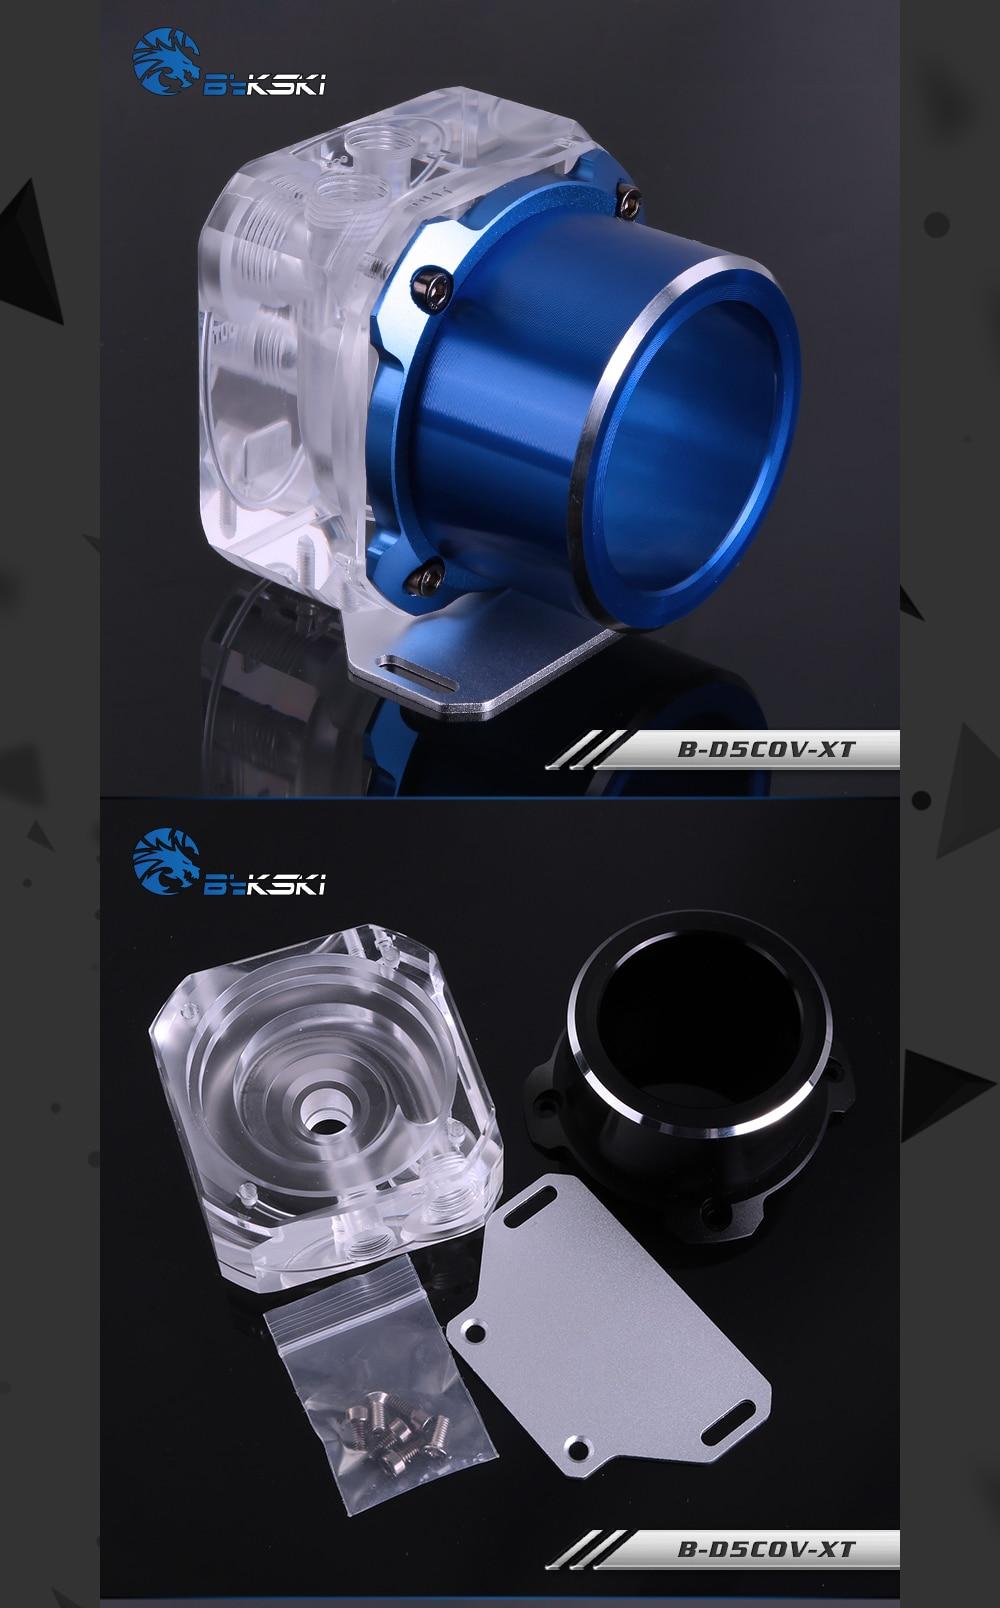 Bykski B-D5COV-XT D5 pump cover/top kit , Armor , High performance , Mute , For D5 Pump , Replace the original cover/top